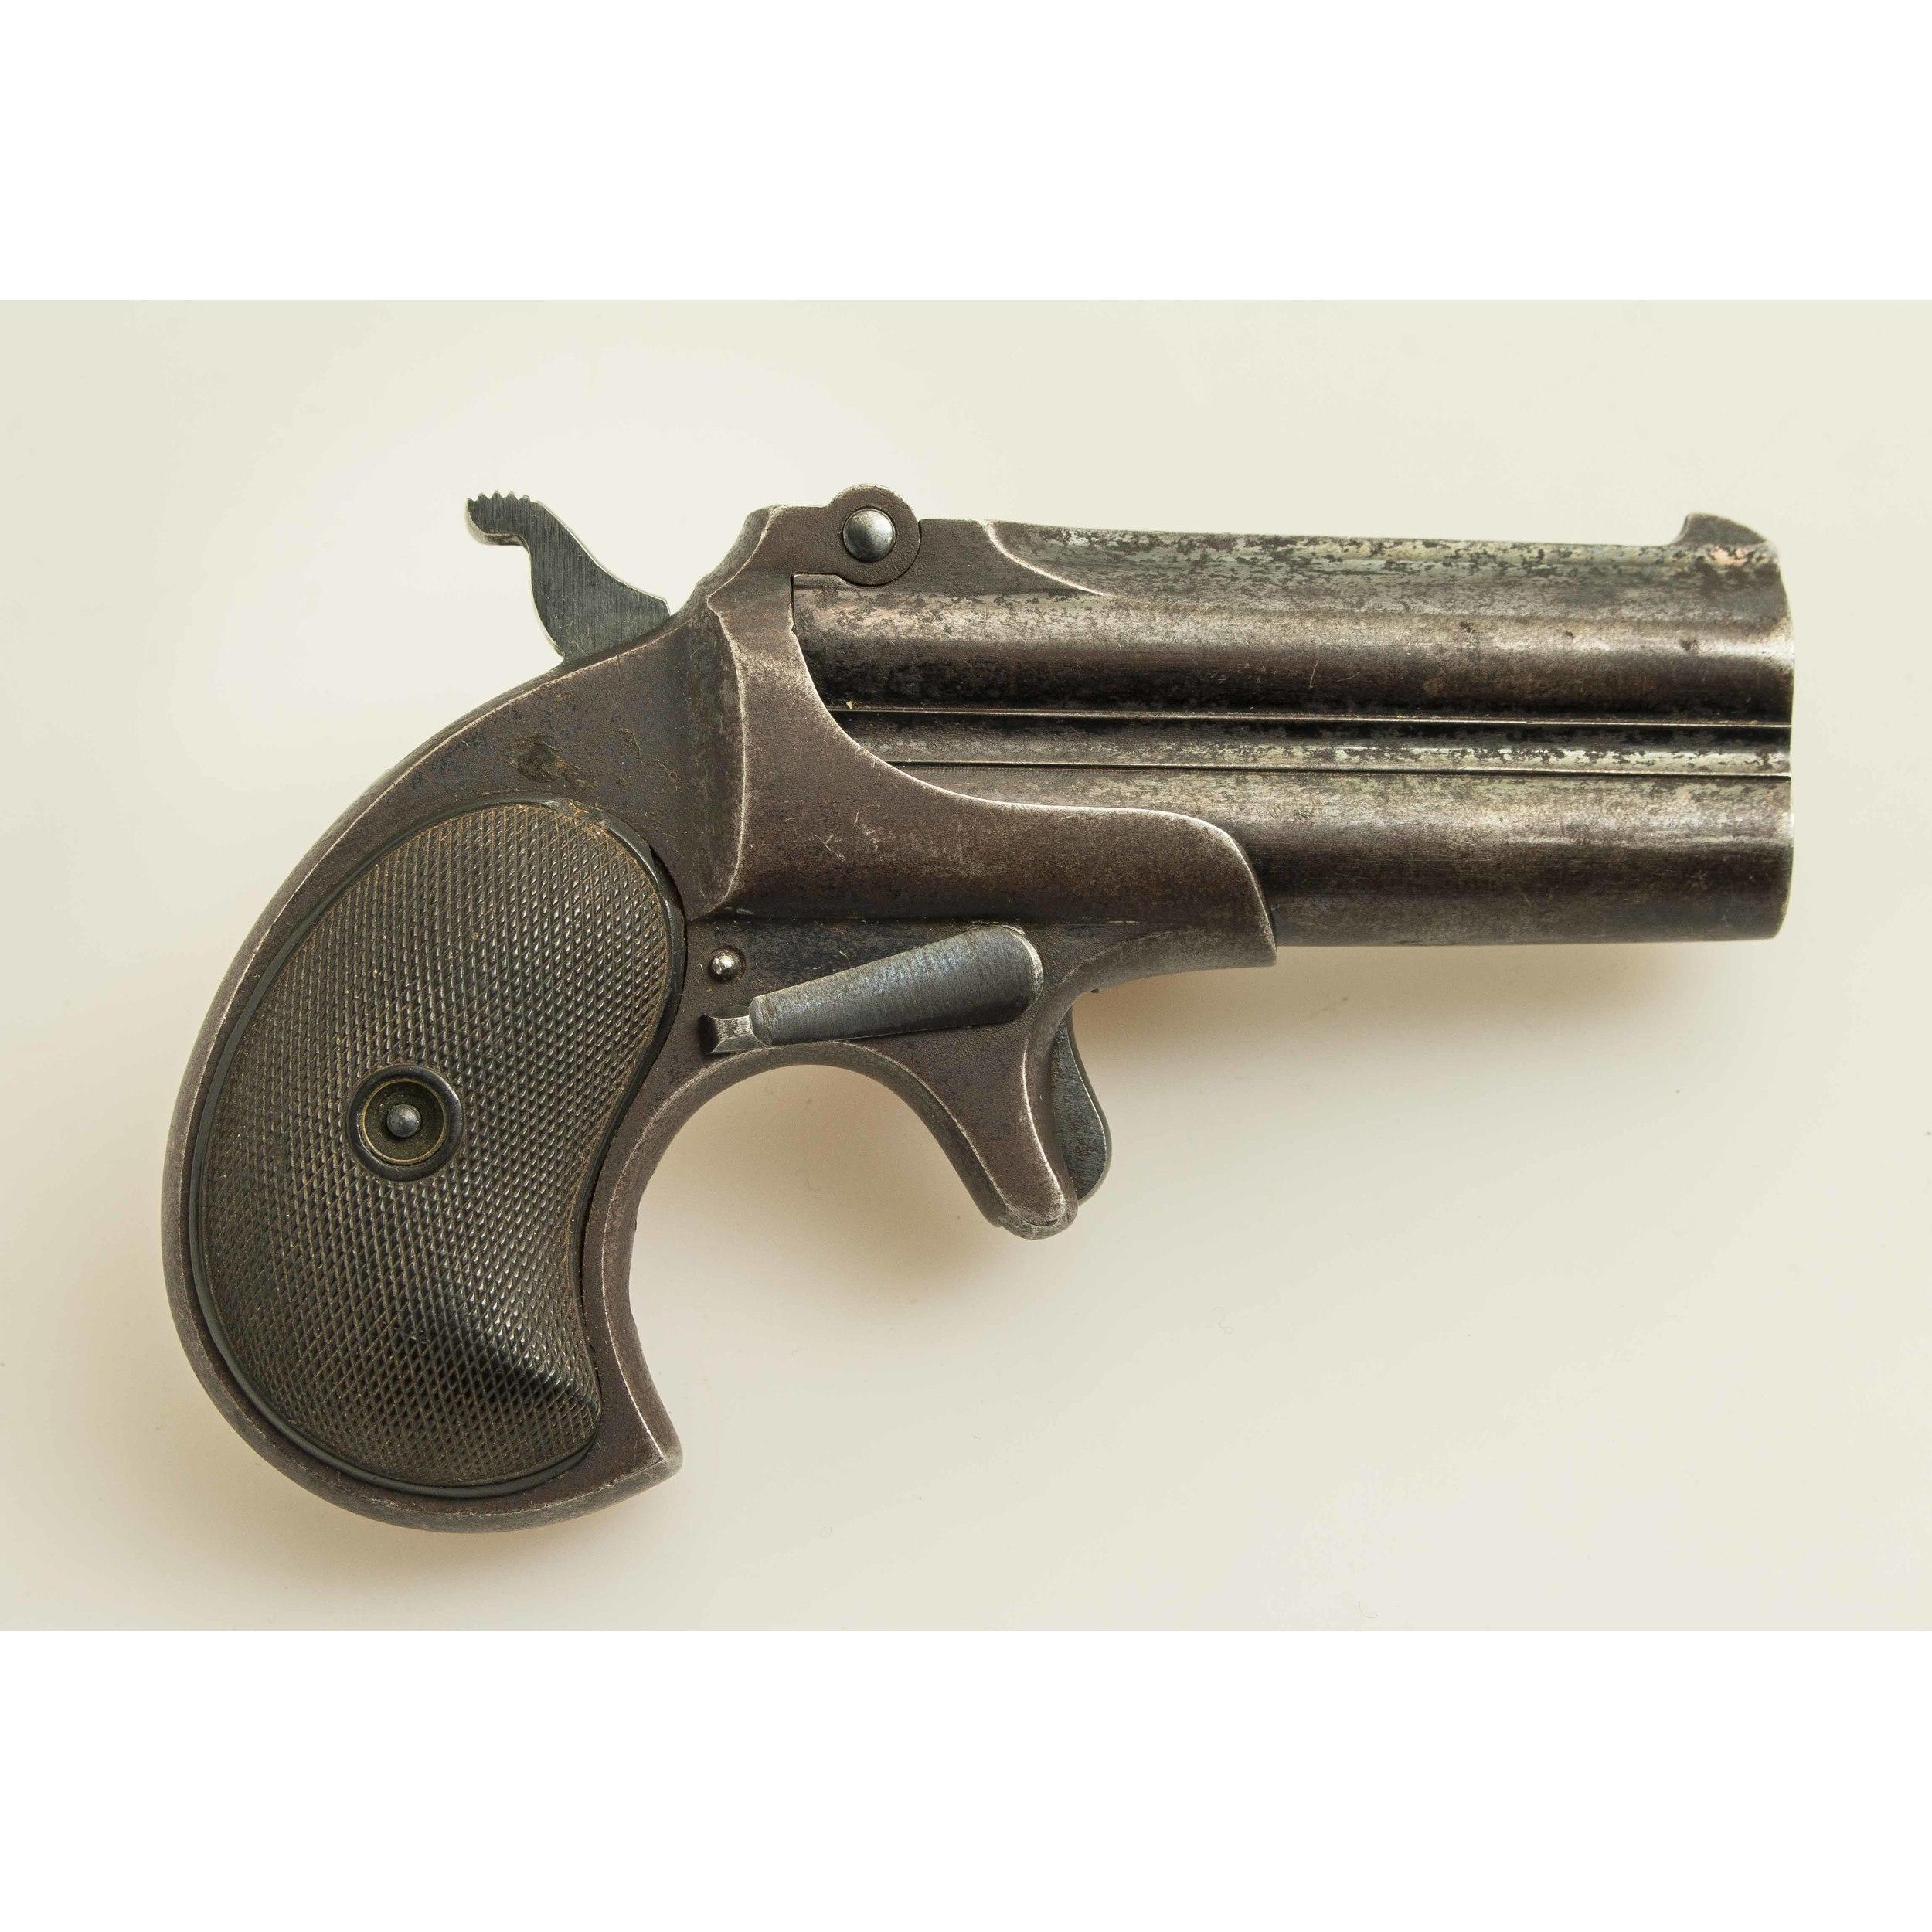 Remington UMC Double Barrel Derringer   Witherell's Auction House